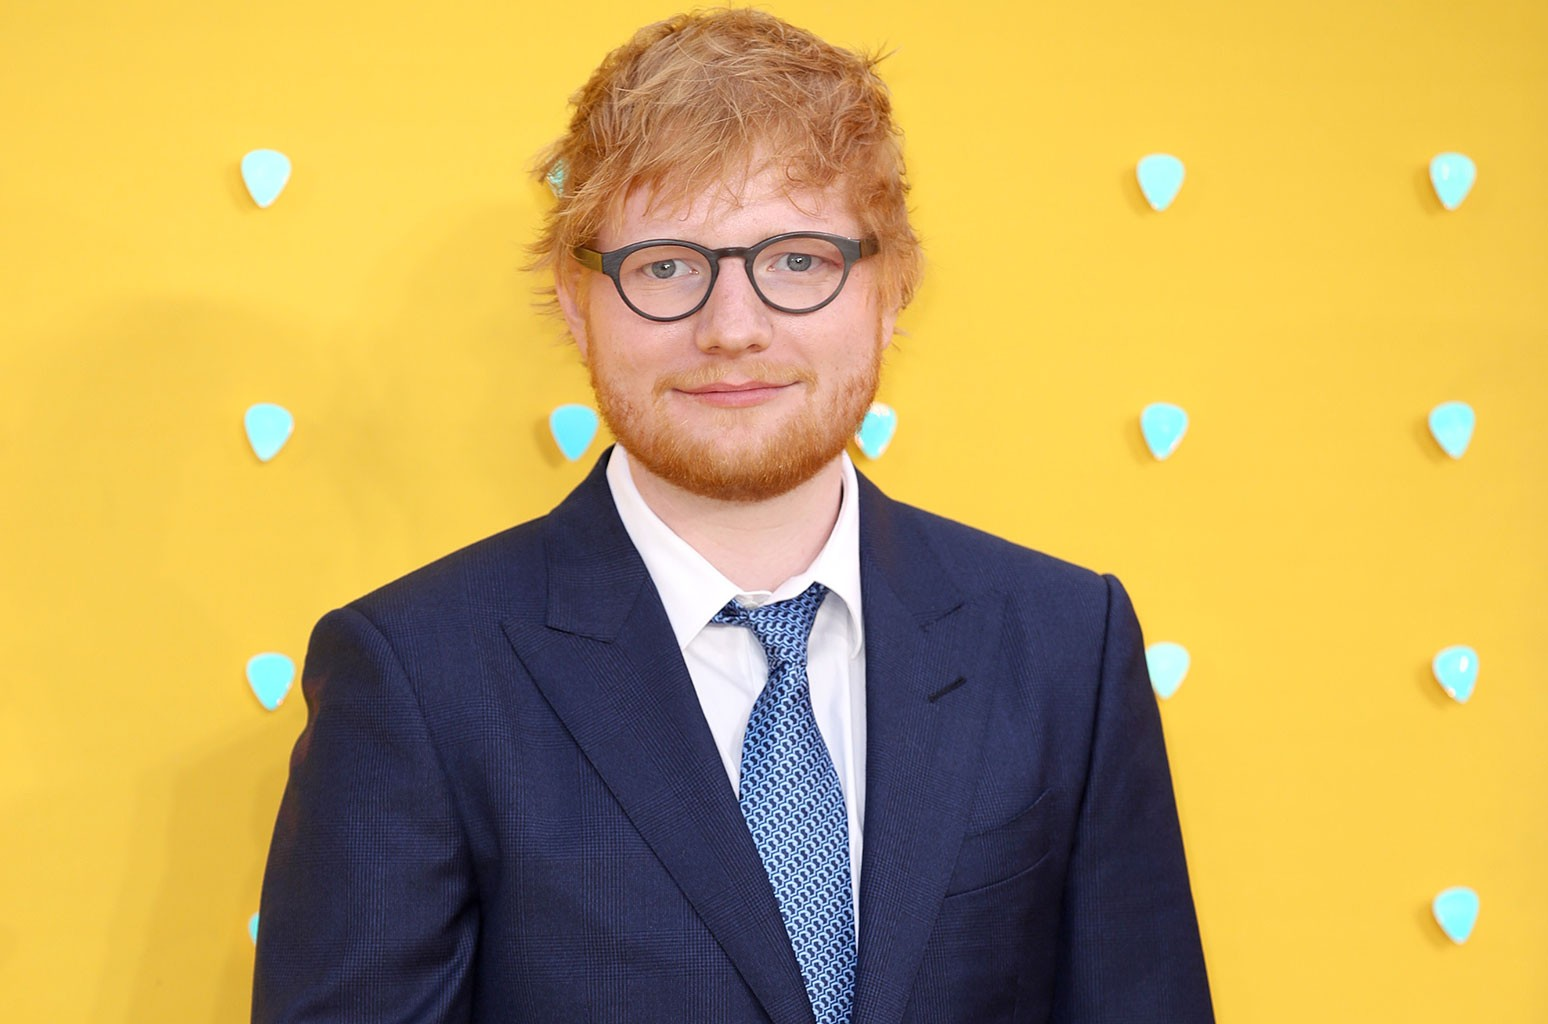 Ed Sheeran's 'Bad Habits' Heading for Second Week Atop U.K. Chart